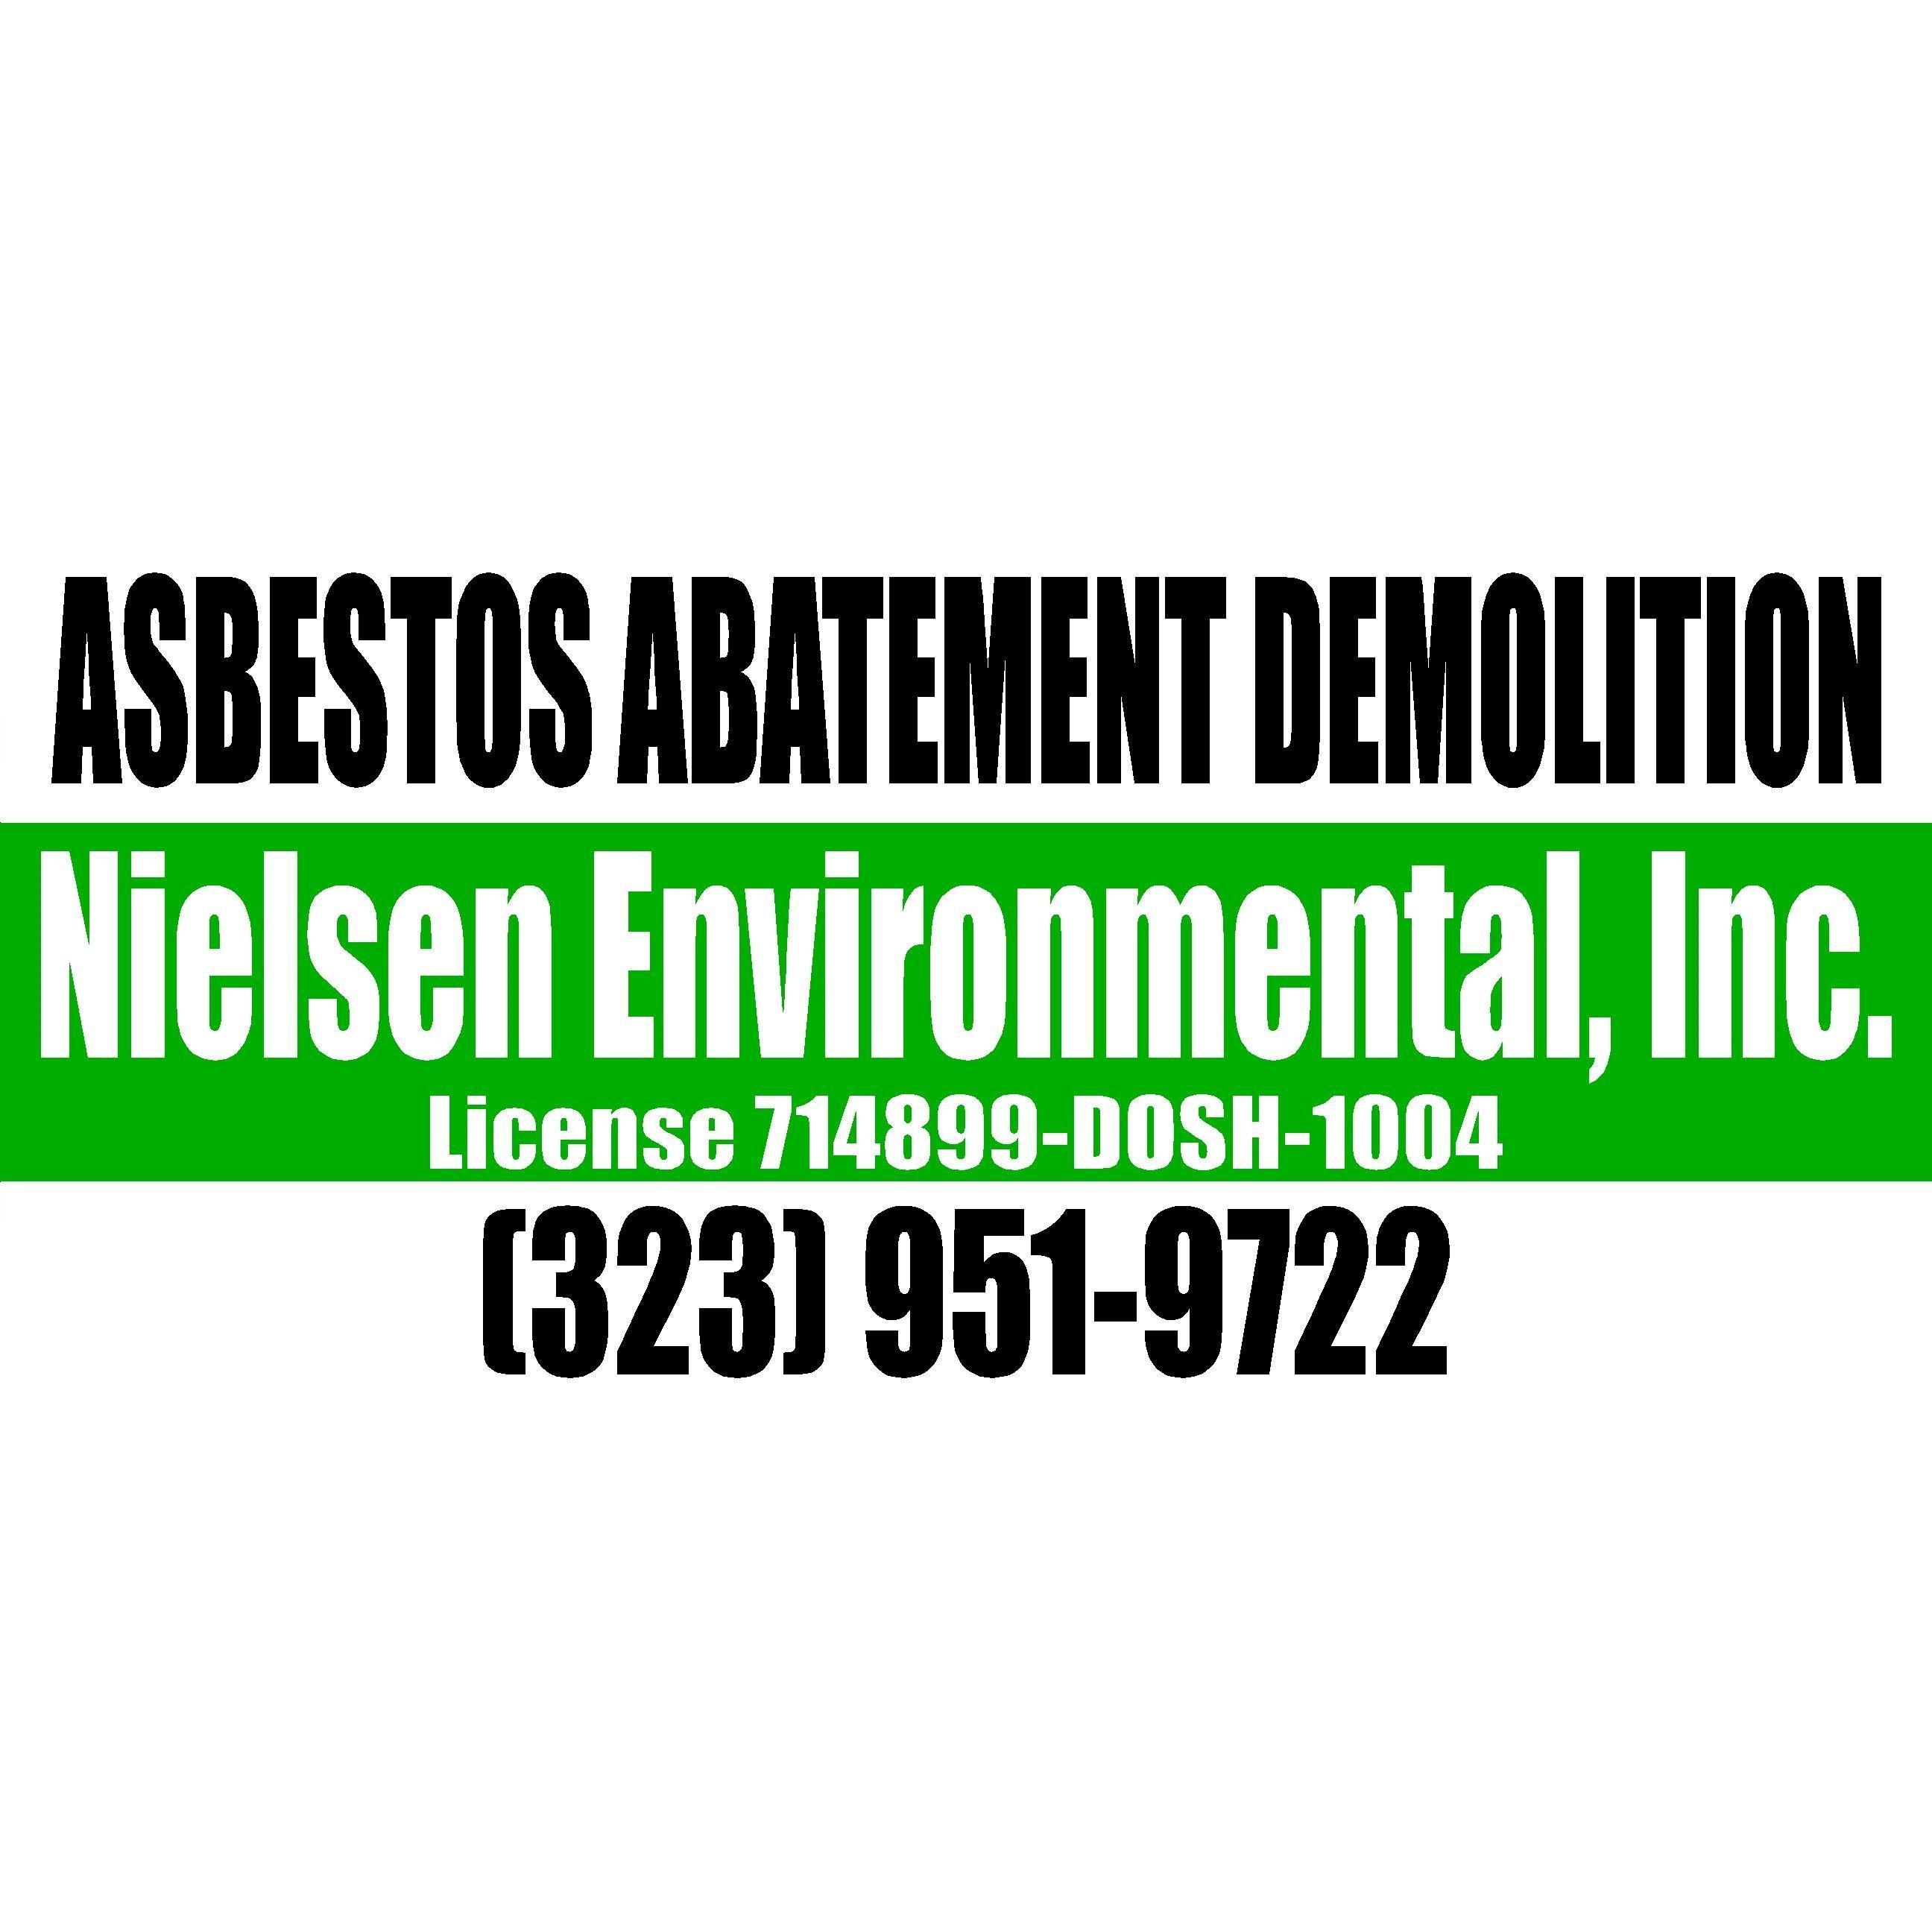 Nielsen Environmental